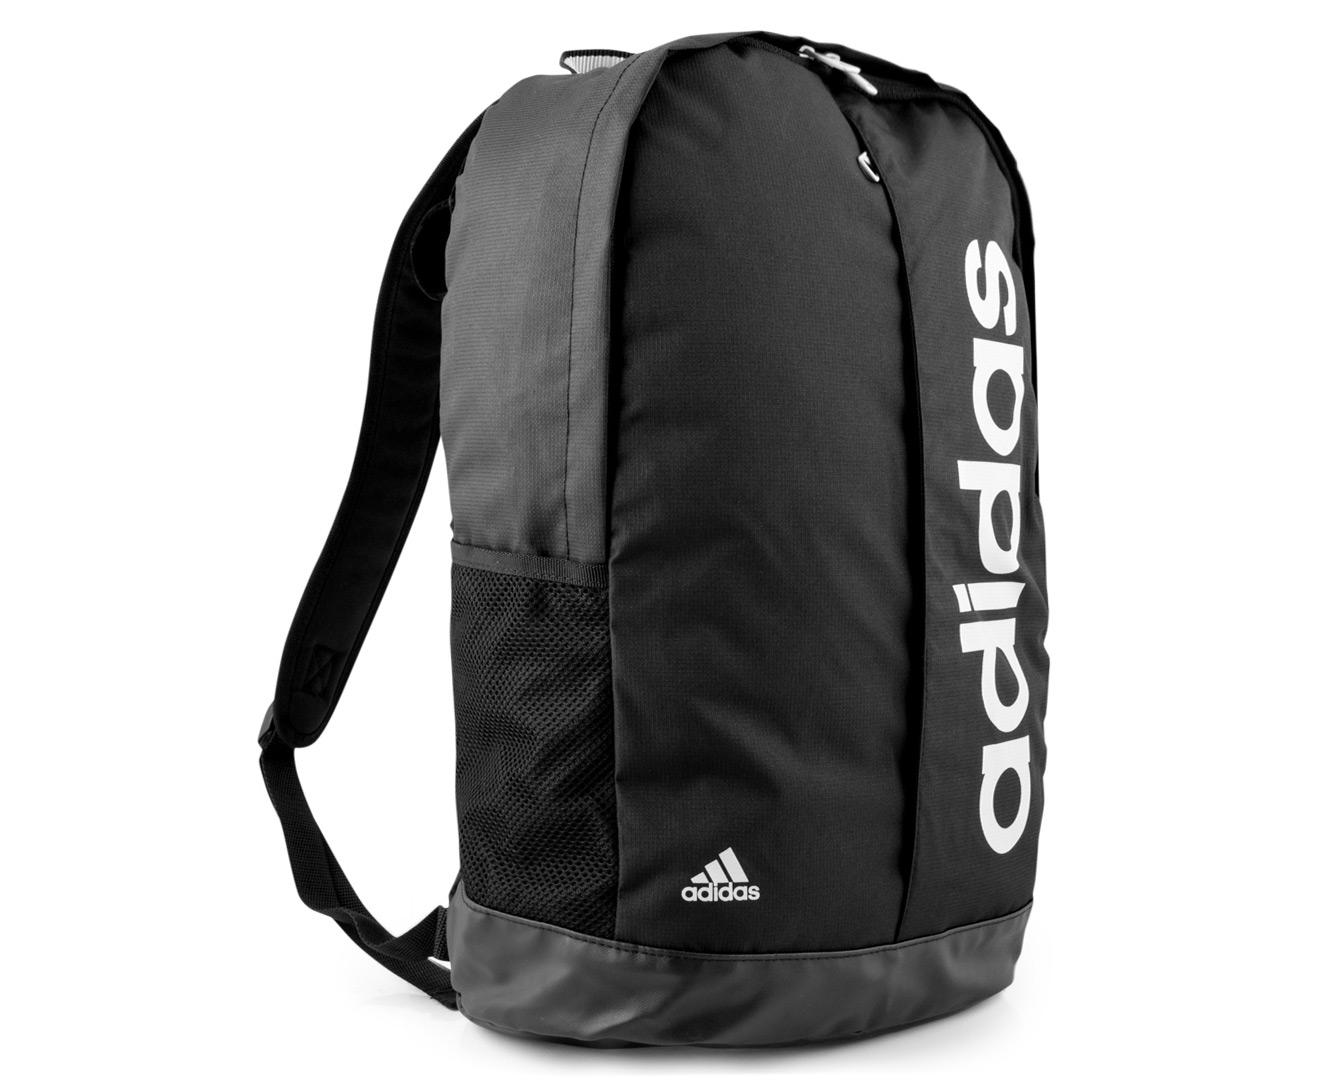 6569b32068 Adidas Linear Performance Backpack - Black Grey